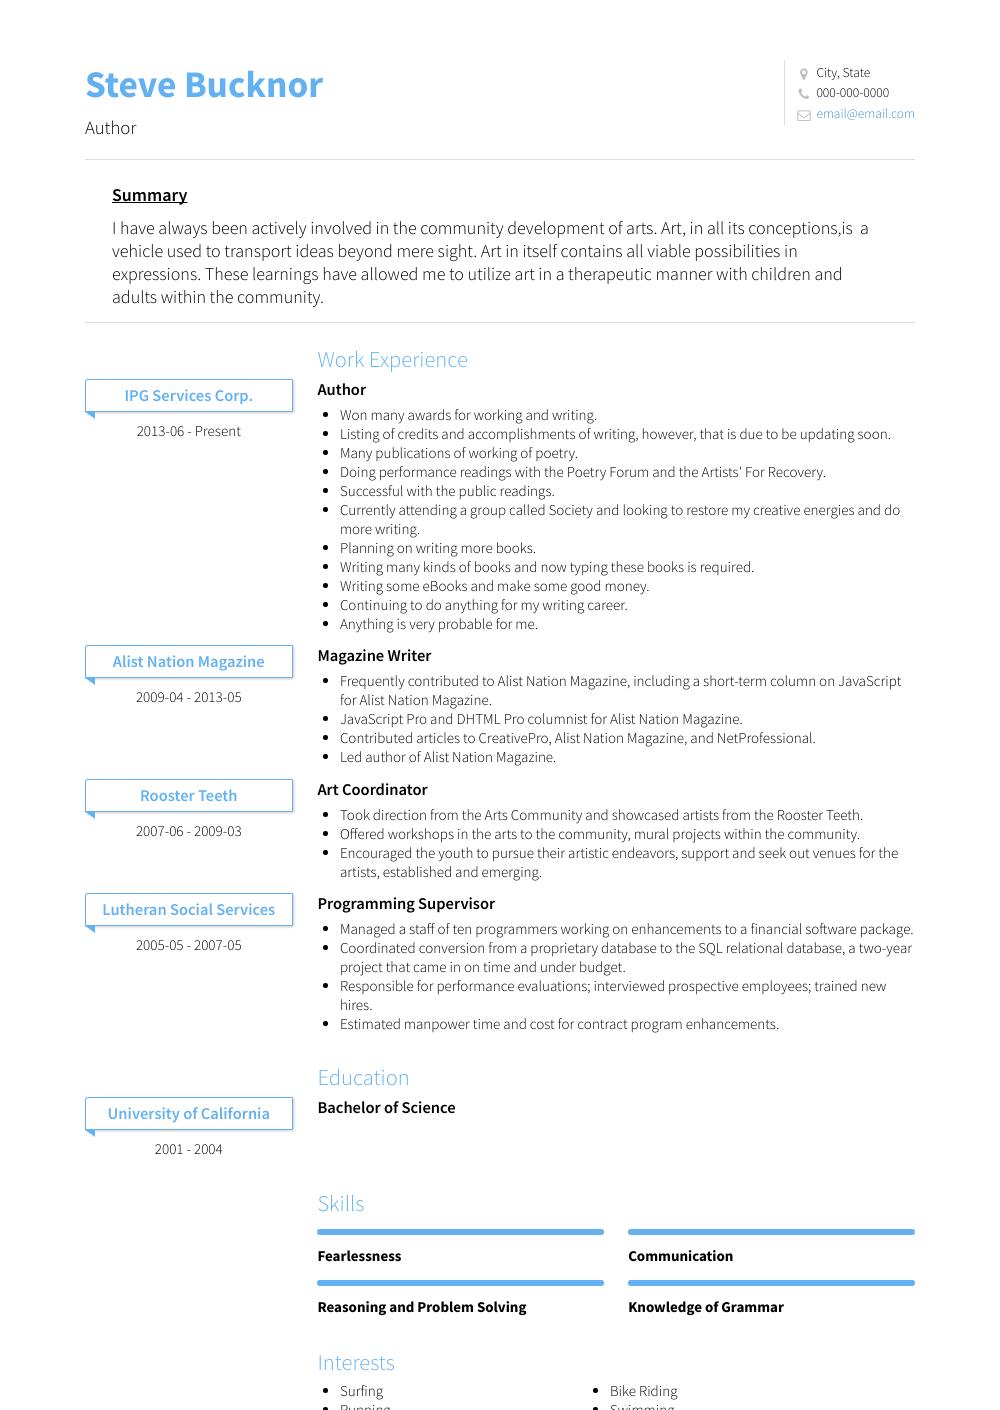 Author Resume Samples & Templates VisualCV